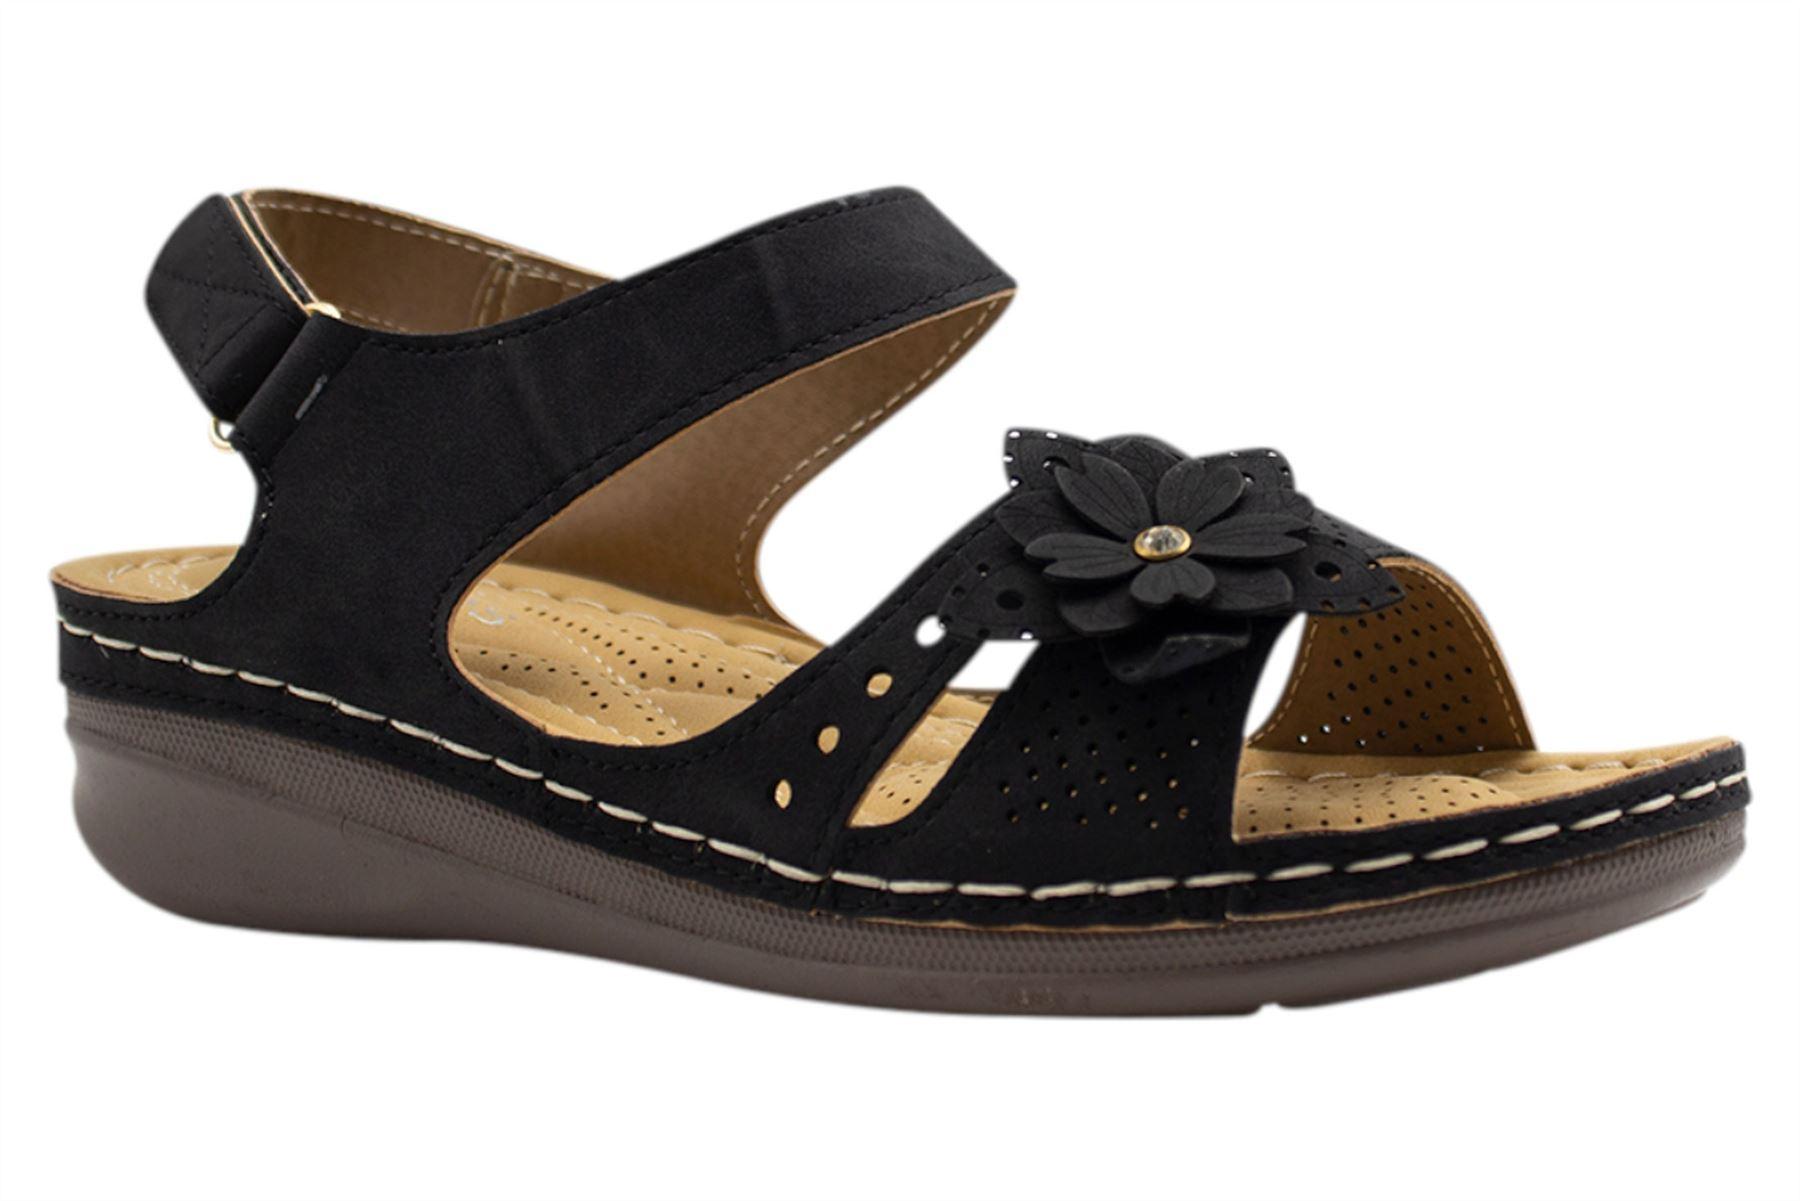 Ladies-Wedge-Heel-Sandal-Womens-Comfort-Cushion-Strapy-Summer-Shoes miniatura 19